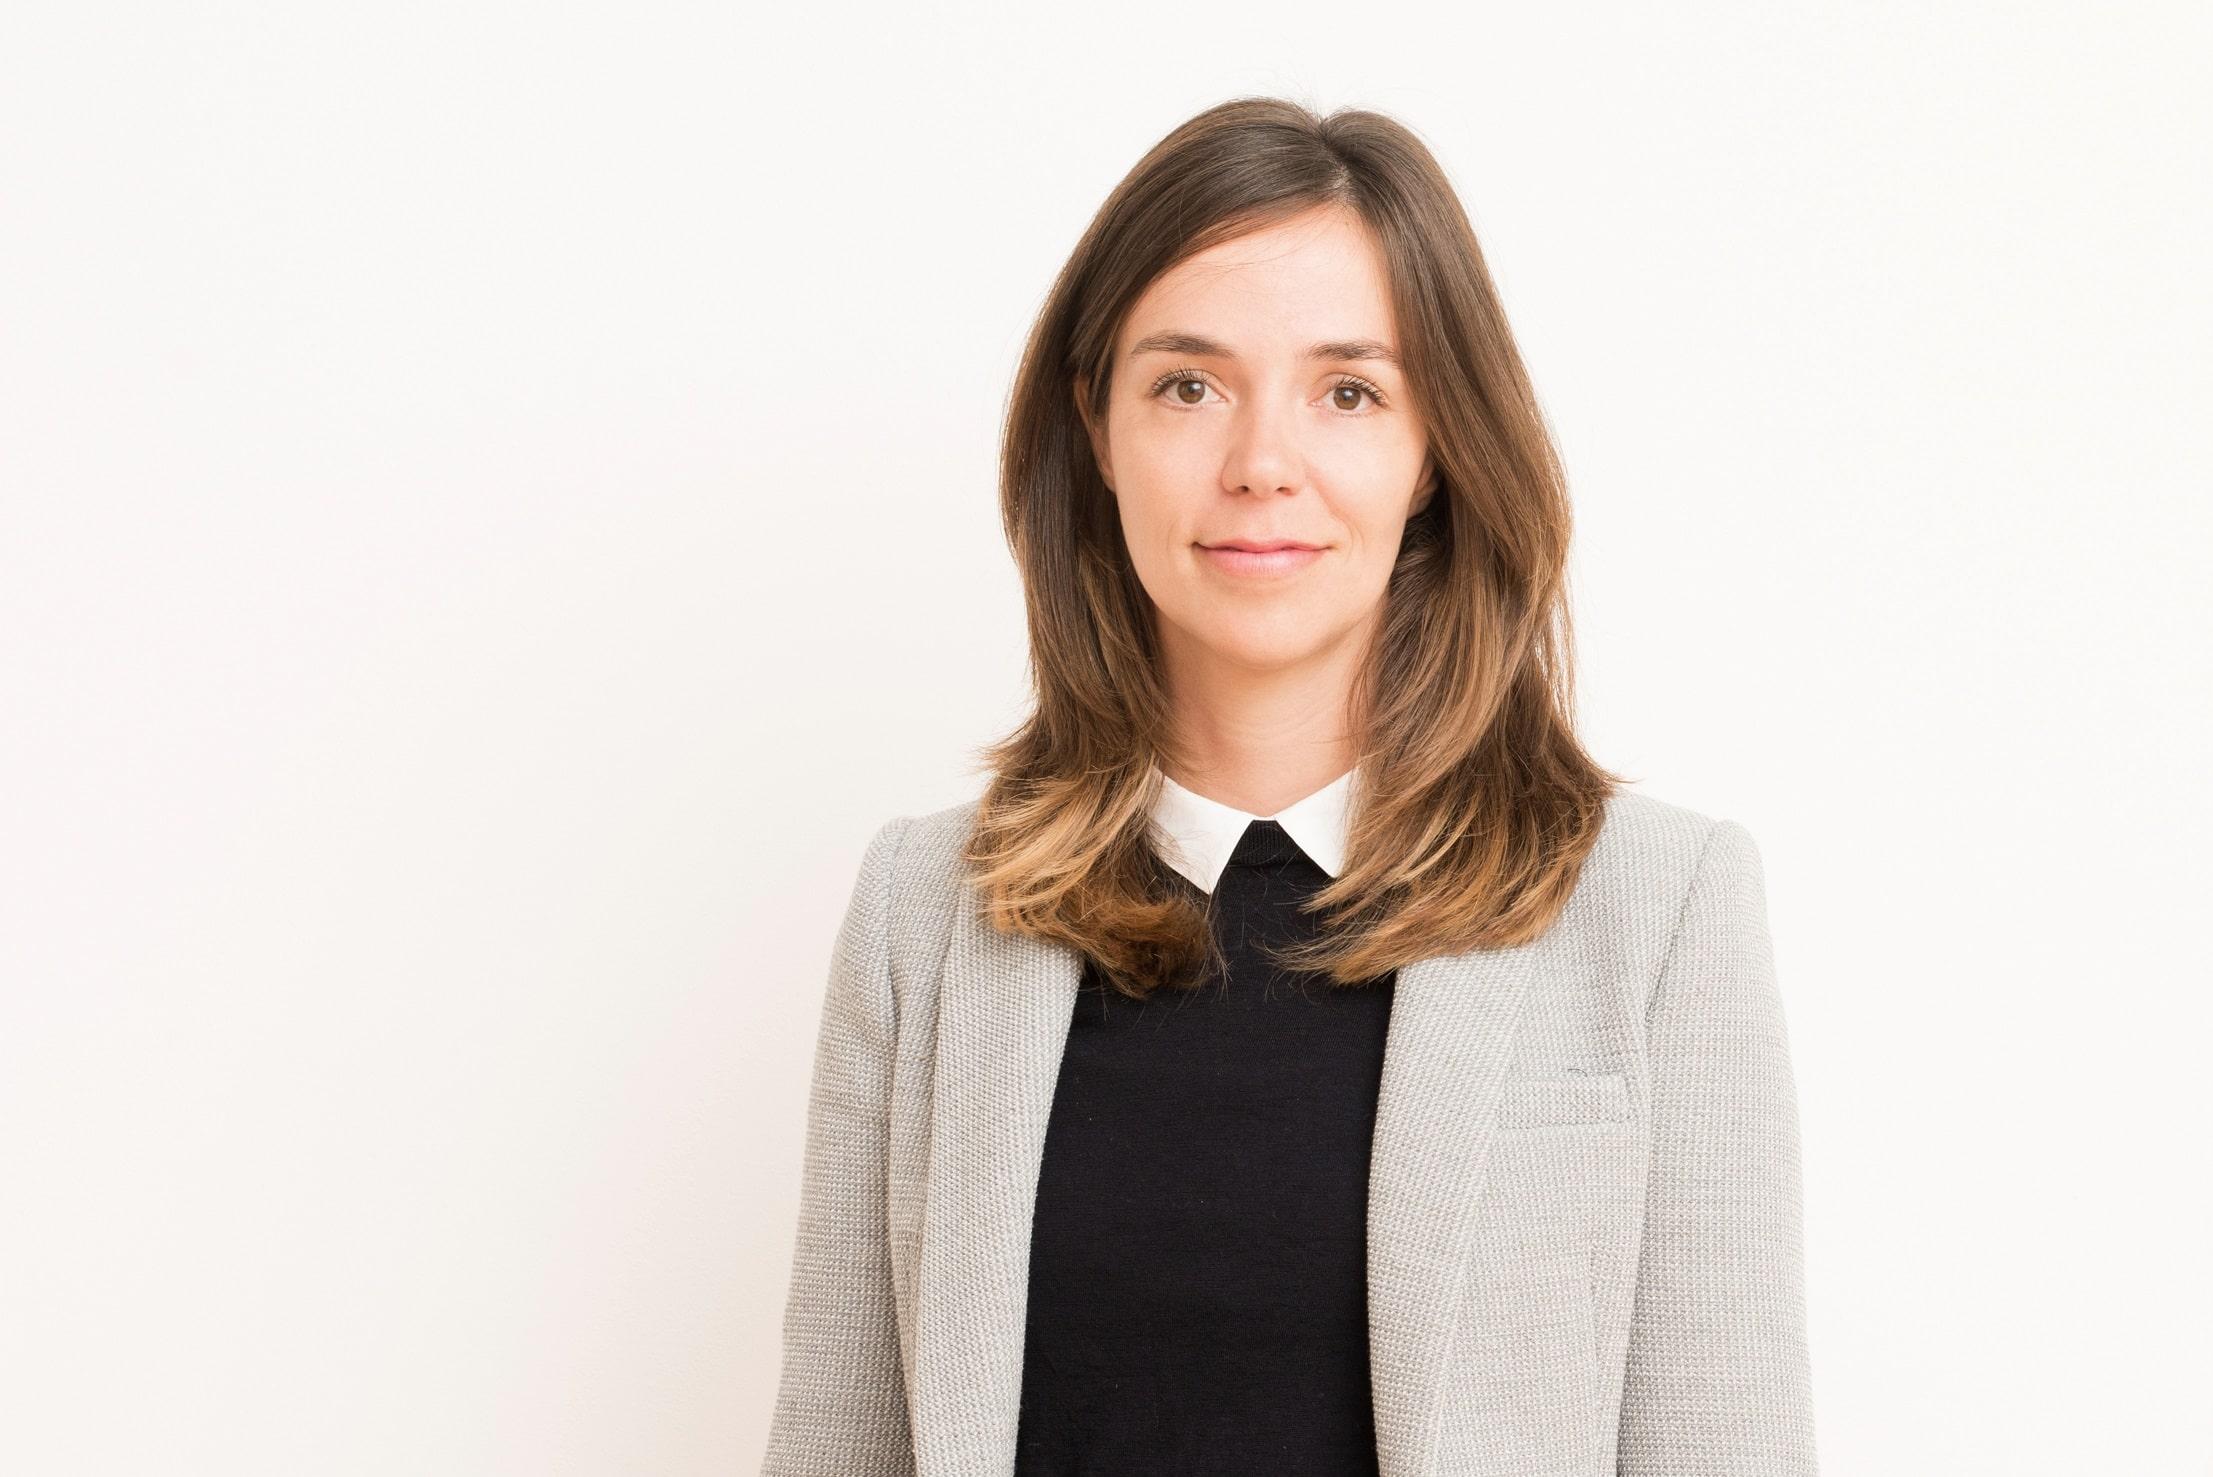 10 Fragen an Marketing-Leitung Liselotte Pichler Kager (Mila)